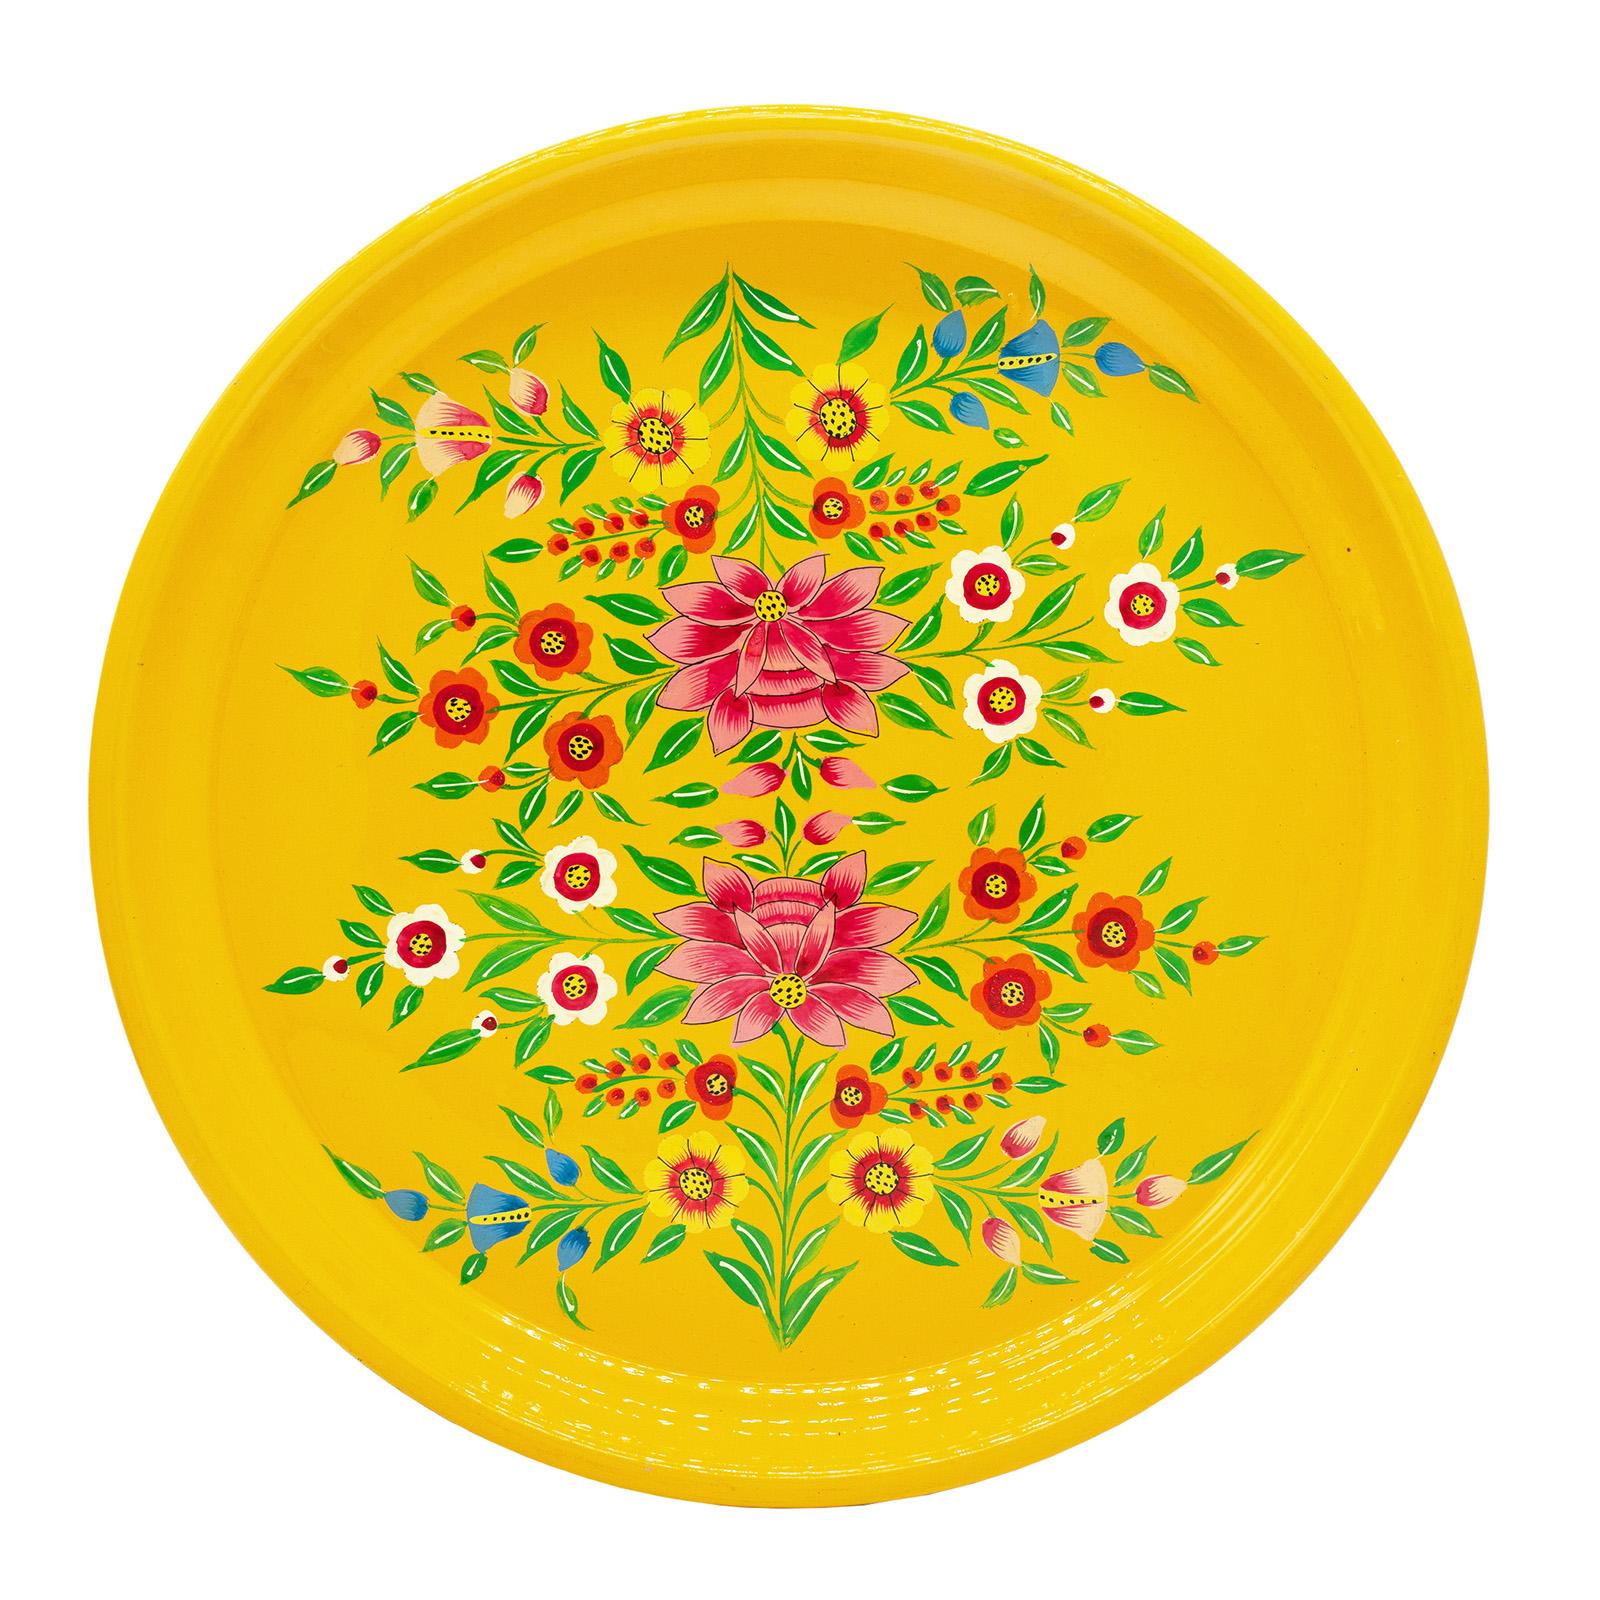 3rd Culture 3rd-5063 Sarı Lotus Tepsi